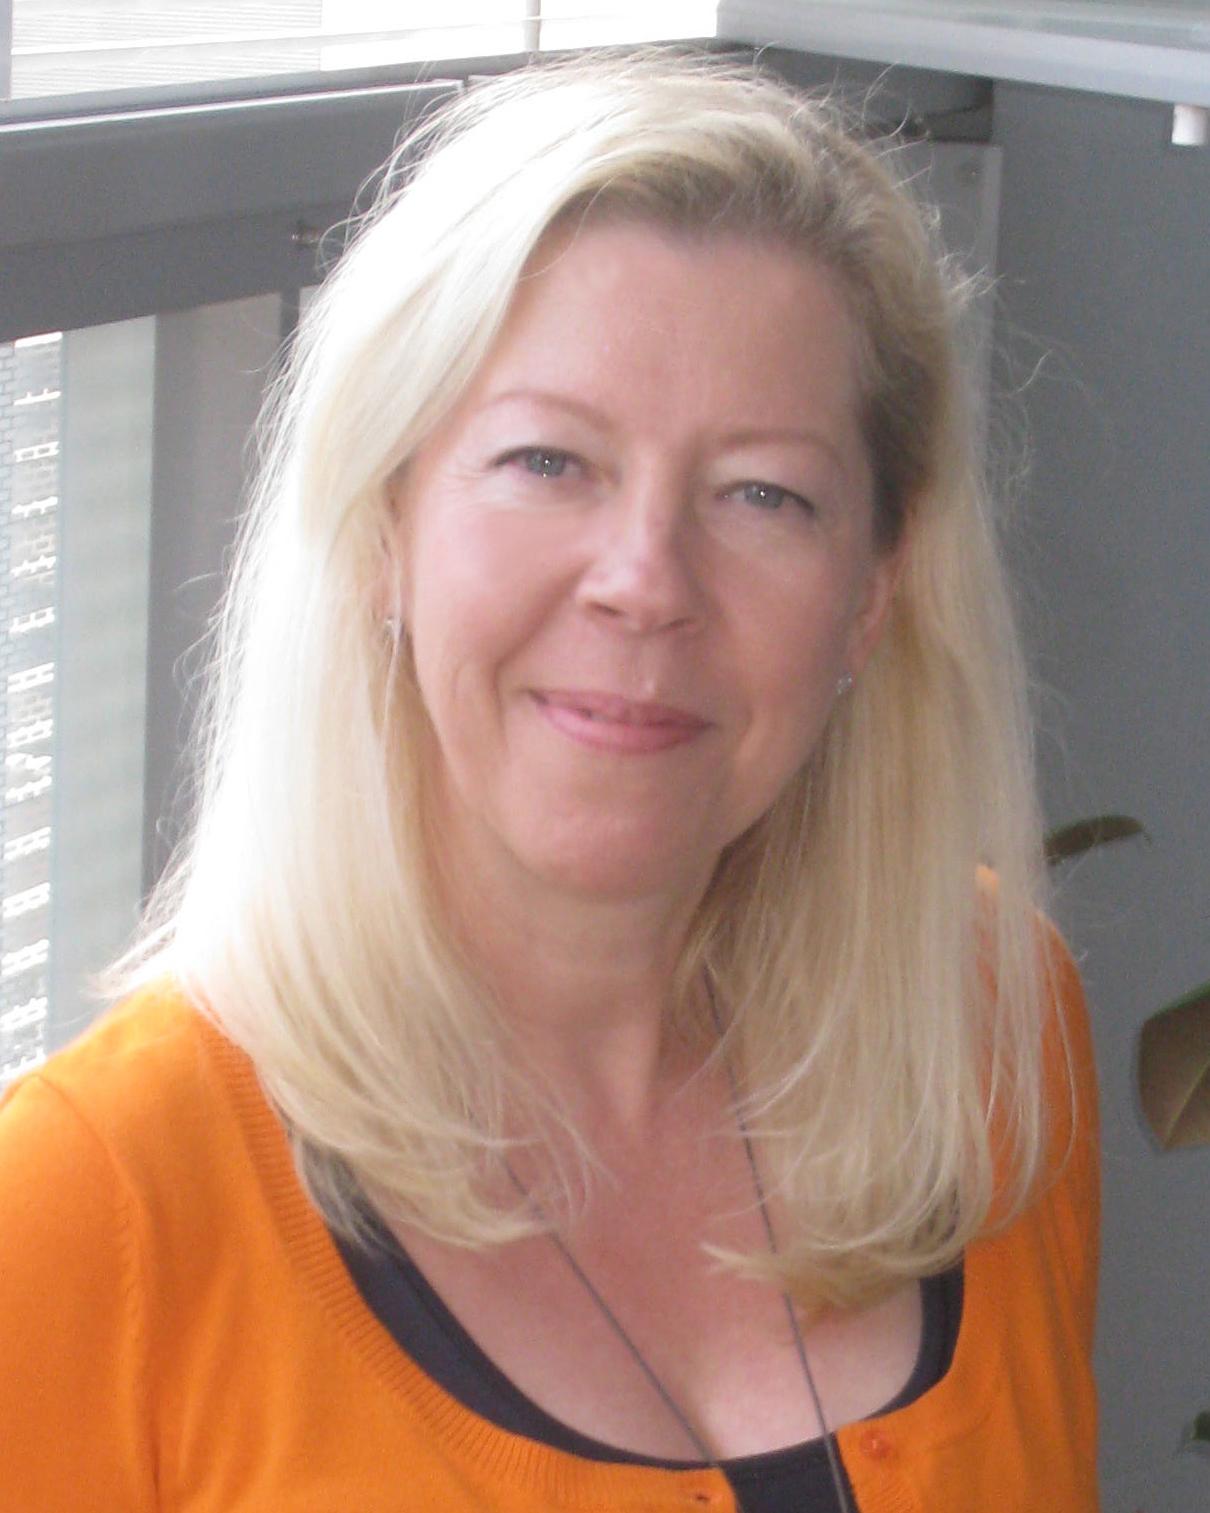 merja v is nen costume design lecturer at aalto university